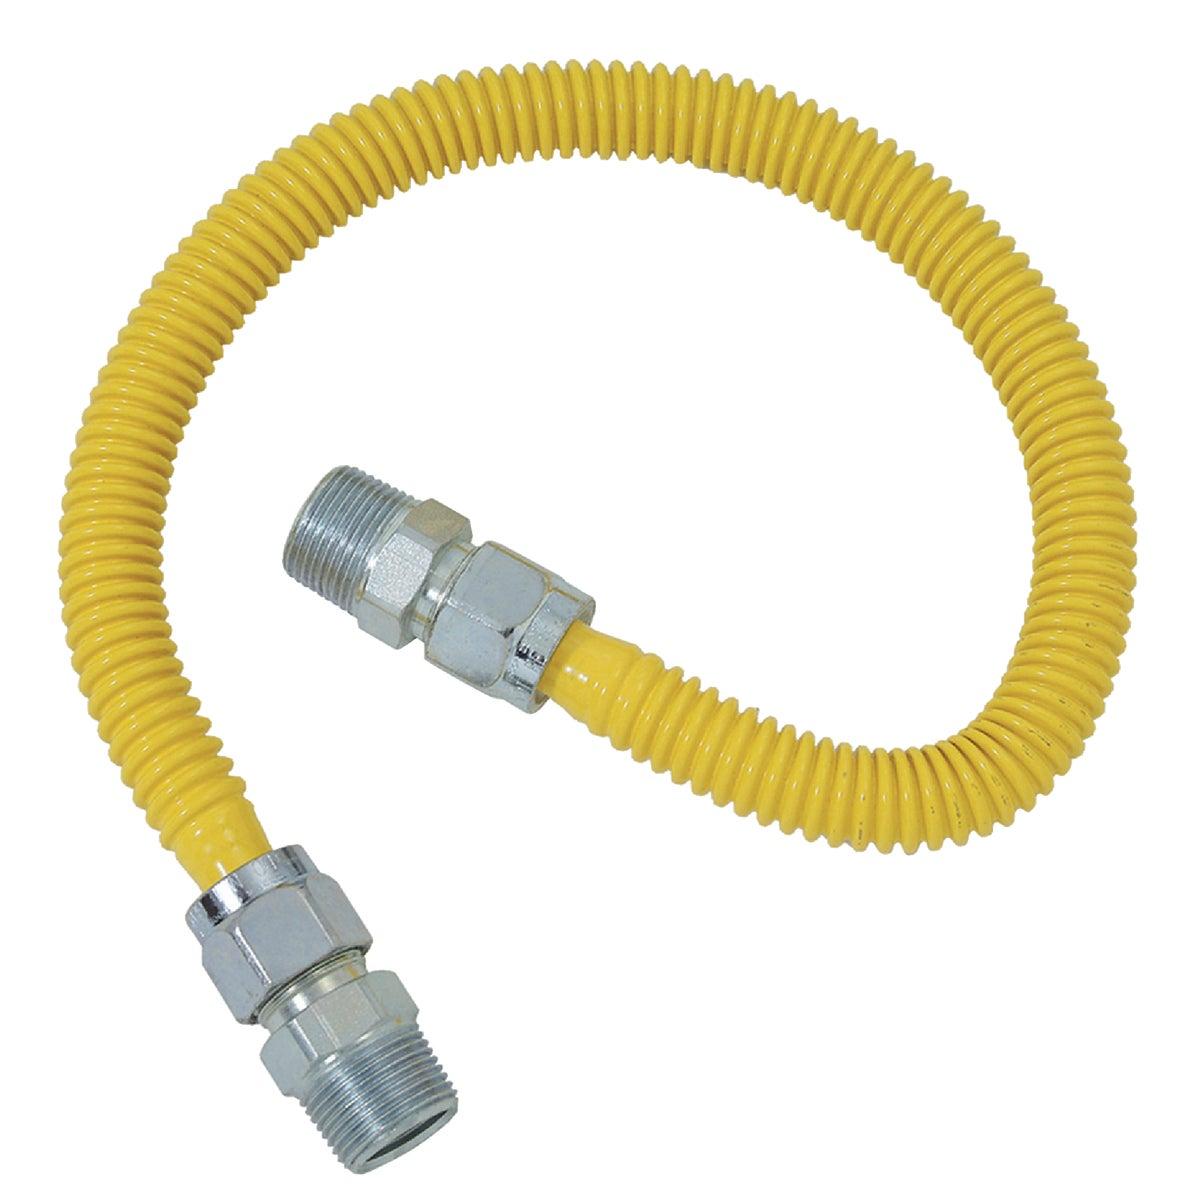 5/8X48 GAS CONNECTOR